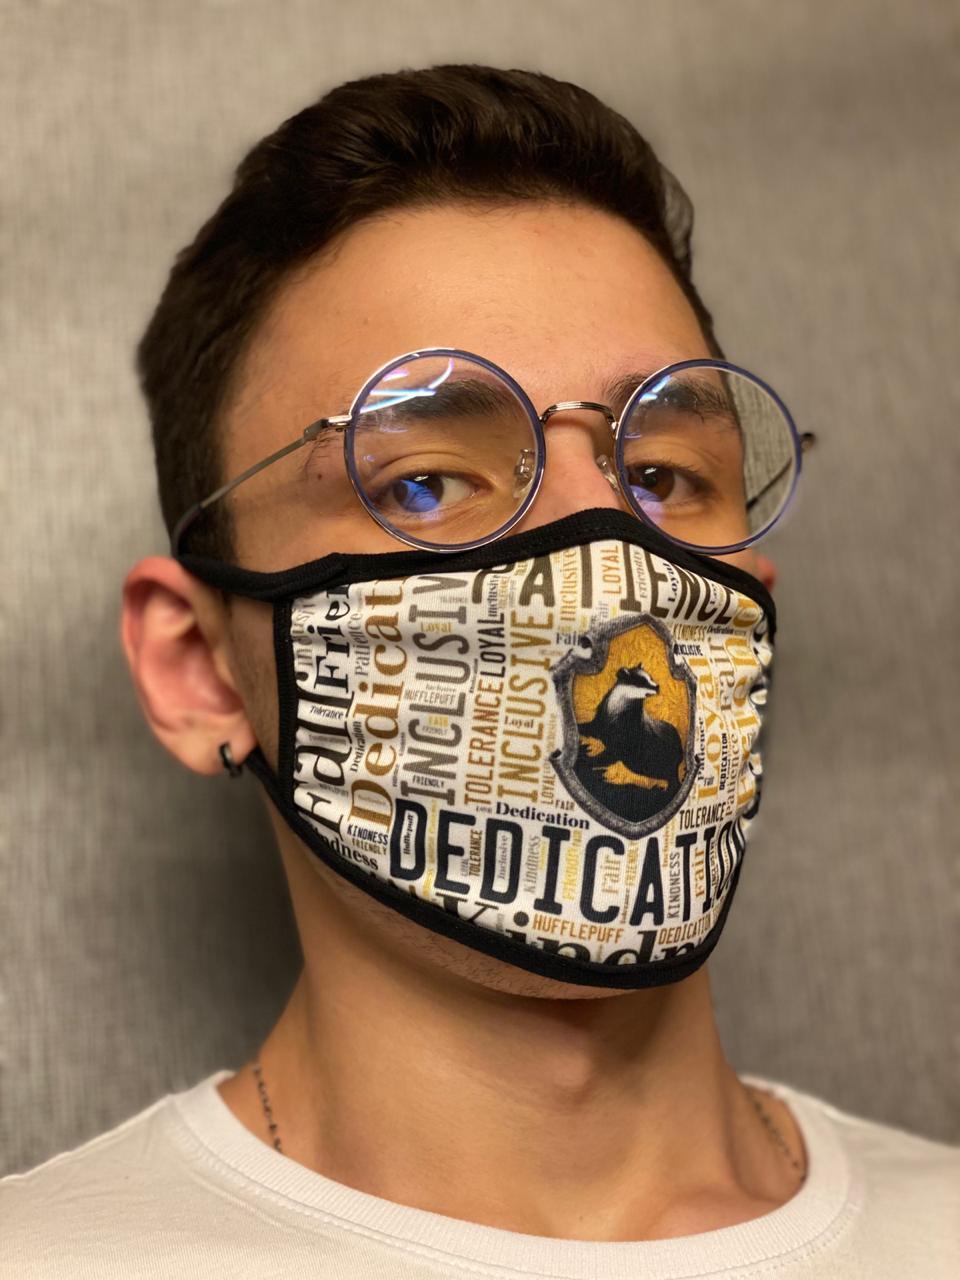 Máscara de Tecido Personalizada Time Escola de Magia Lavável Reutilizável - EV